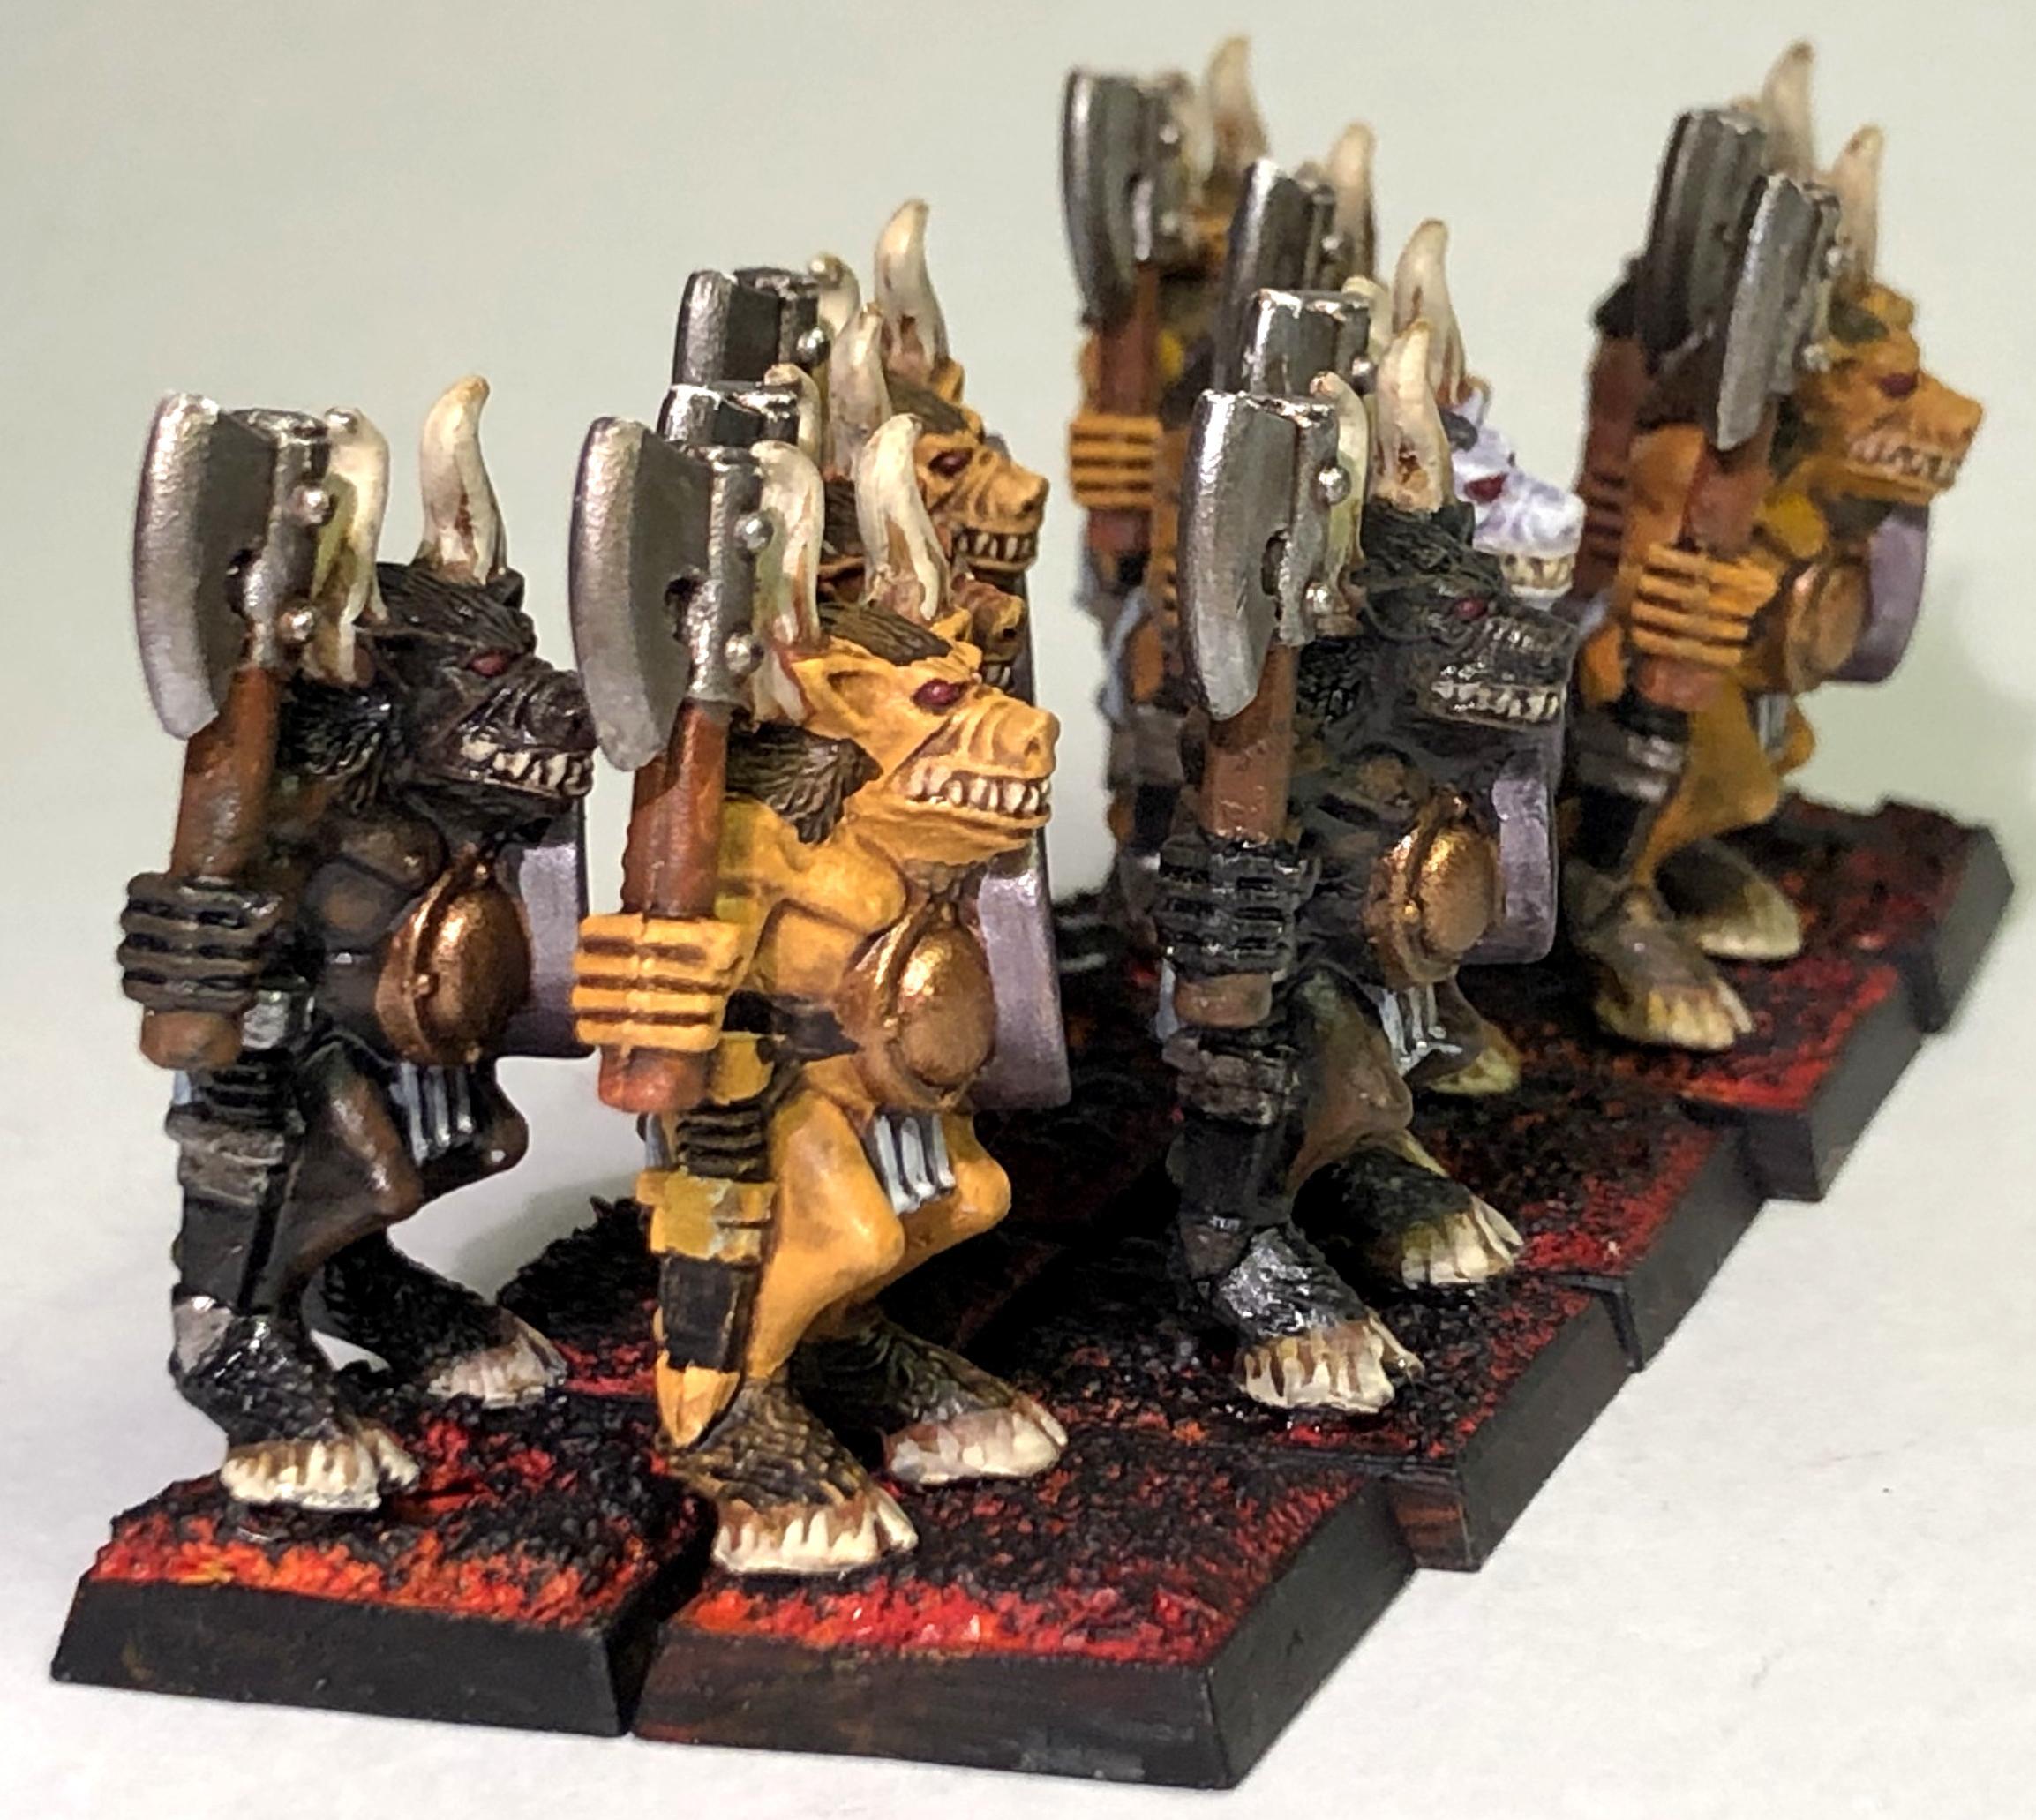 Battle Masters, Beastmen, Slaanesh